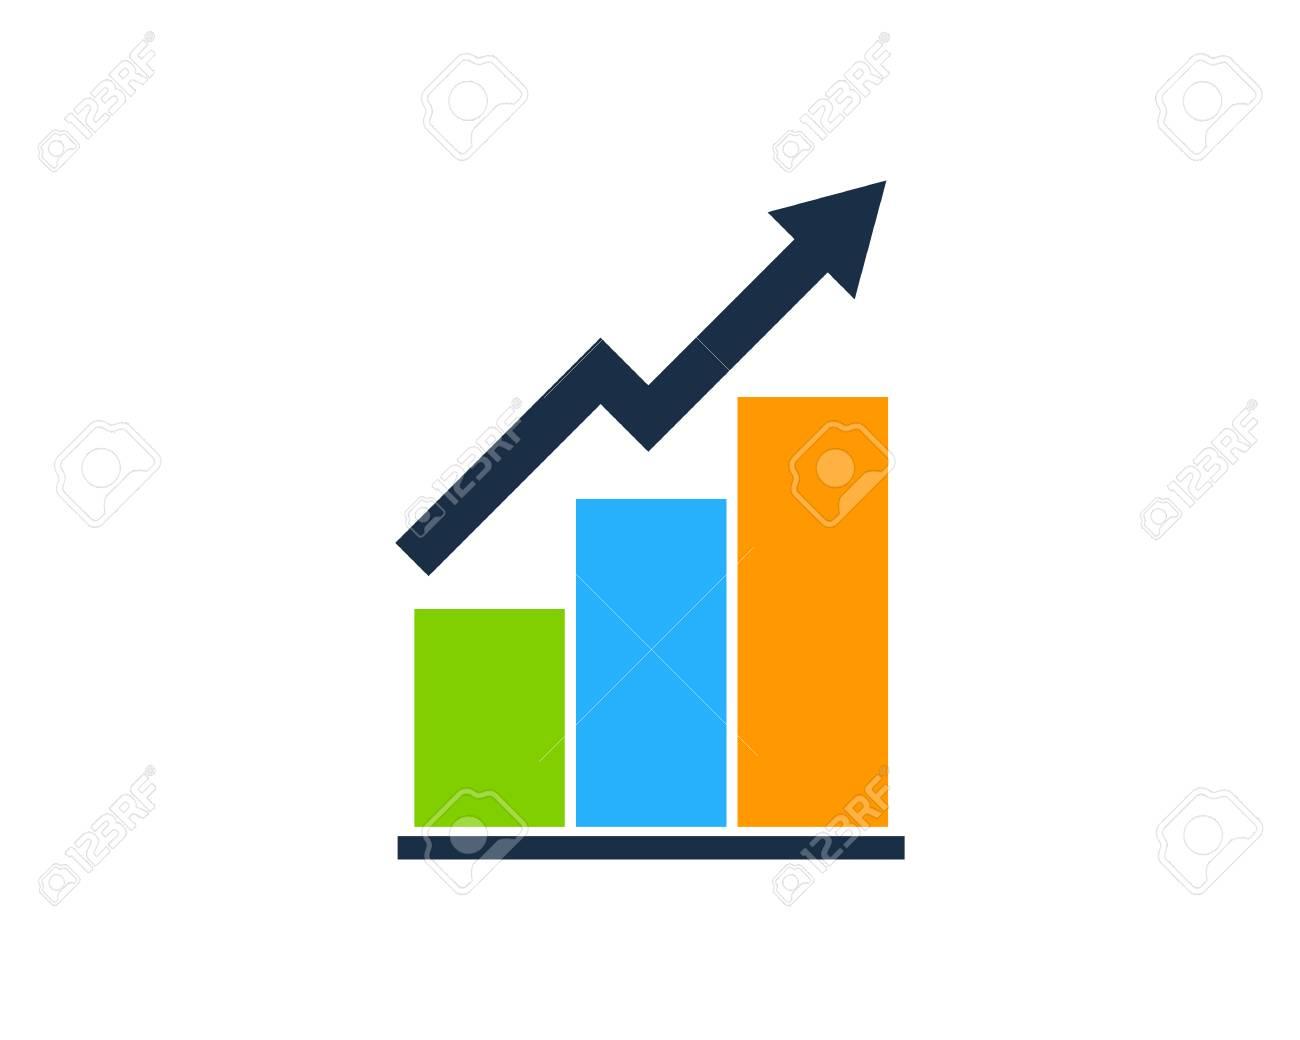 Stock Market Business Icon Logo Design Element - 80806099